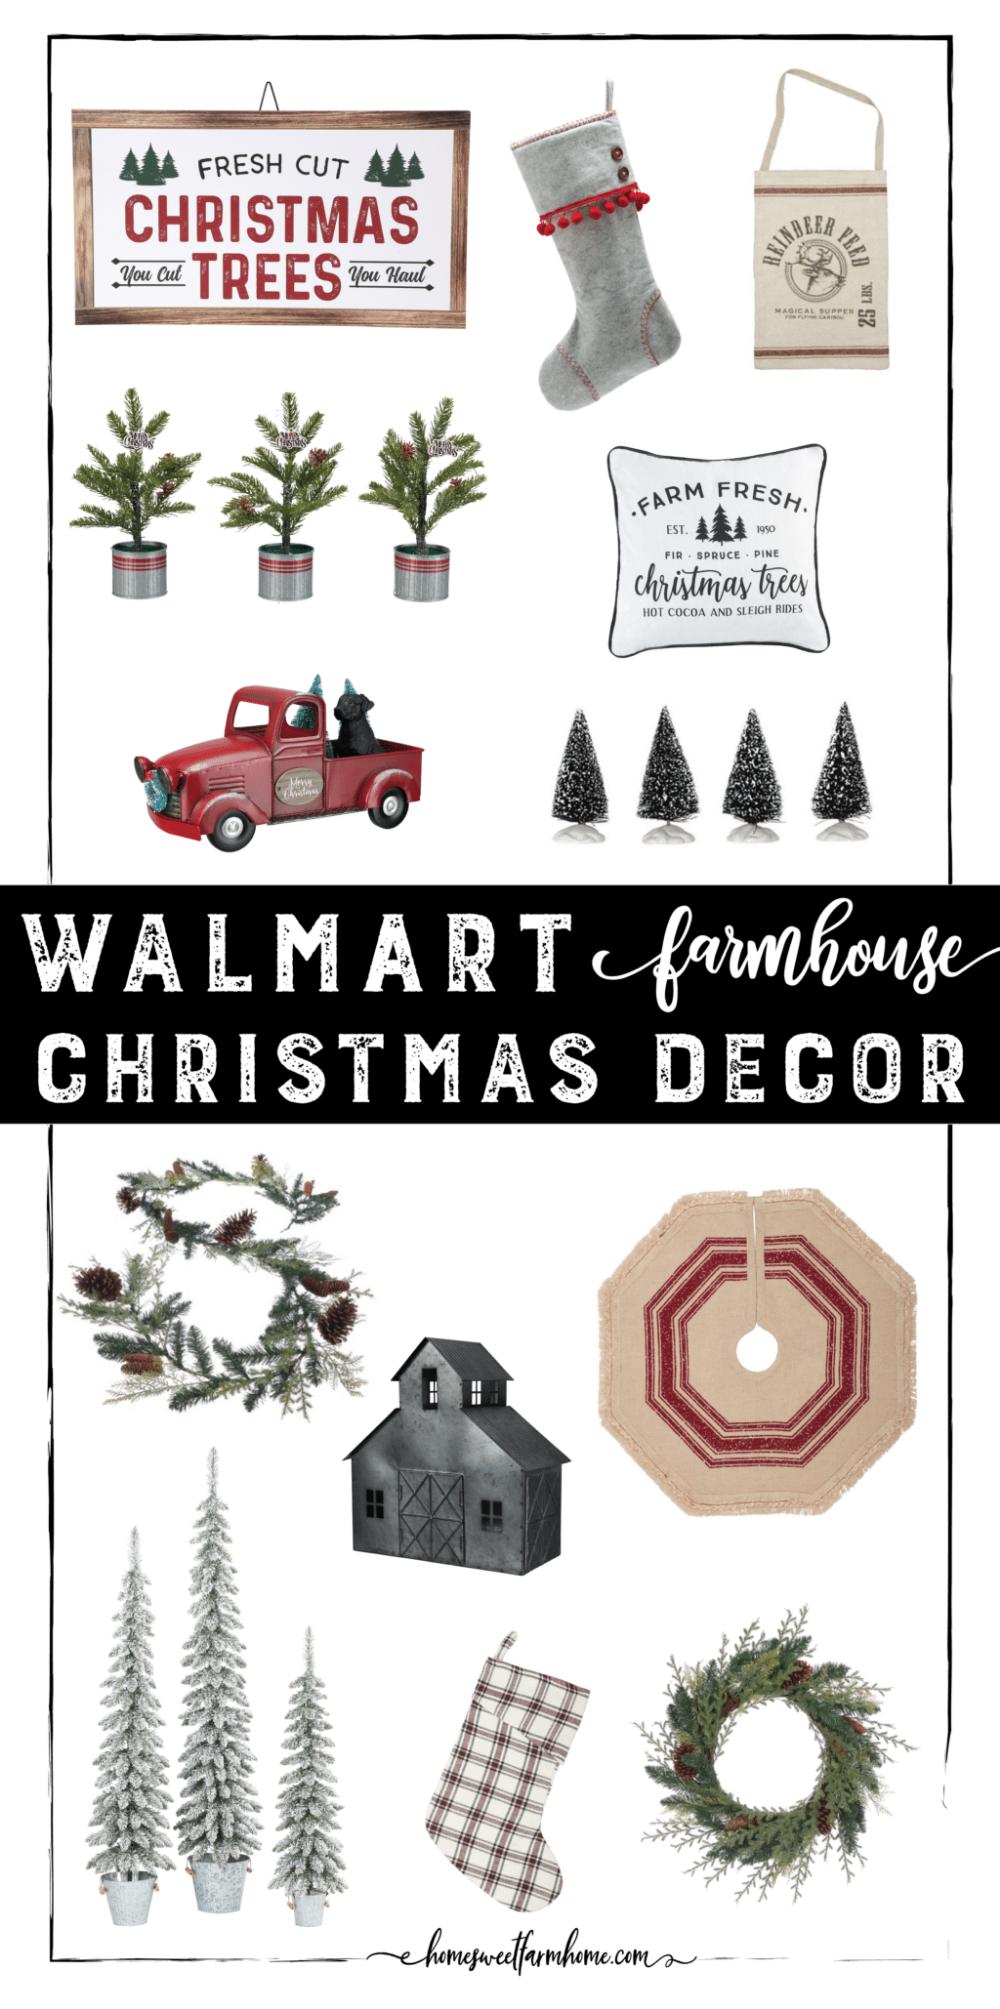 Walmart Farmhouse Christmas Decor  Walmart Farmhouse Christmas Decor The Best Wa...,  #Christ...#christ #christmas #decor #farmhouse #walmart